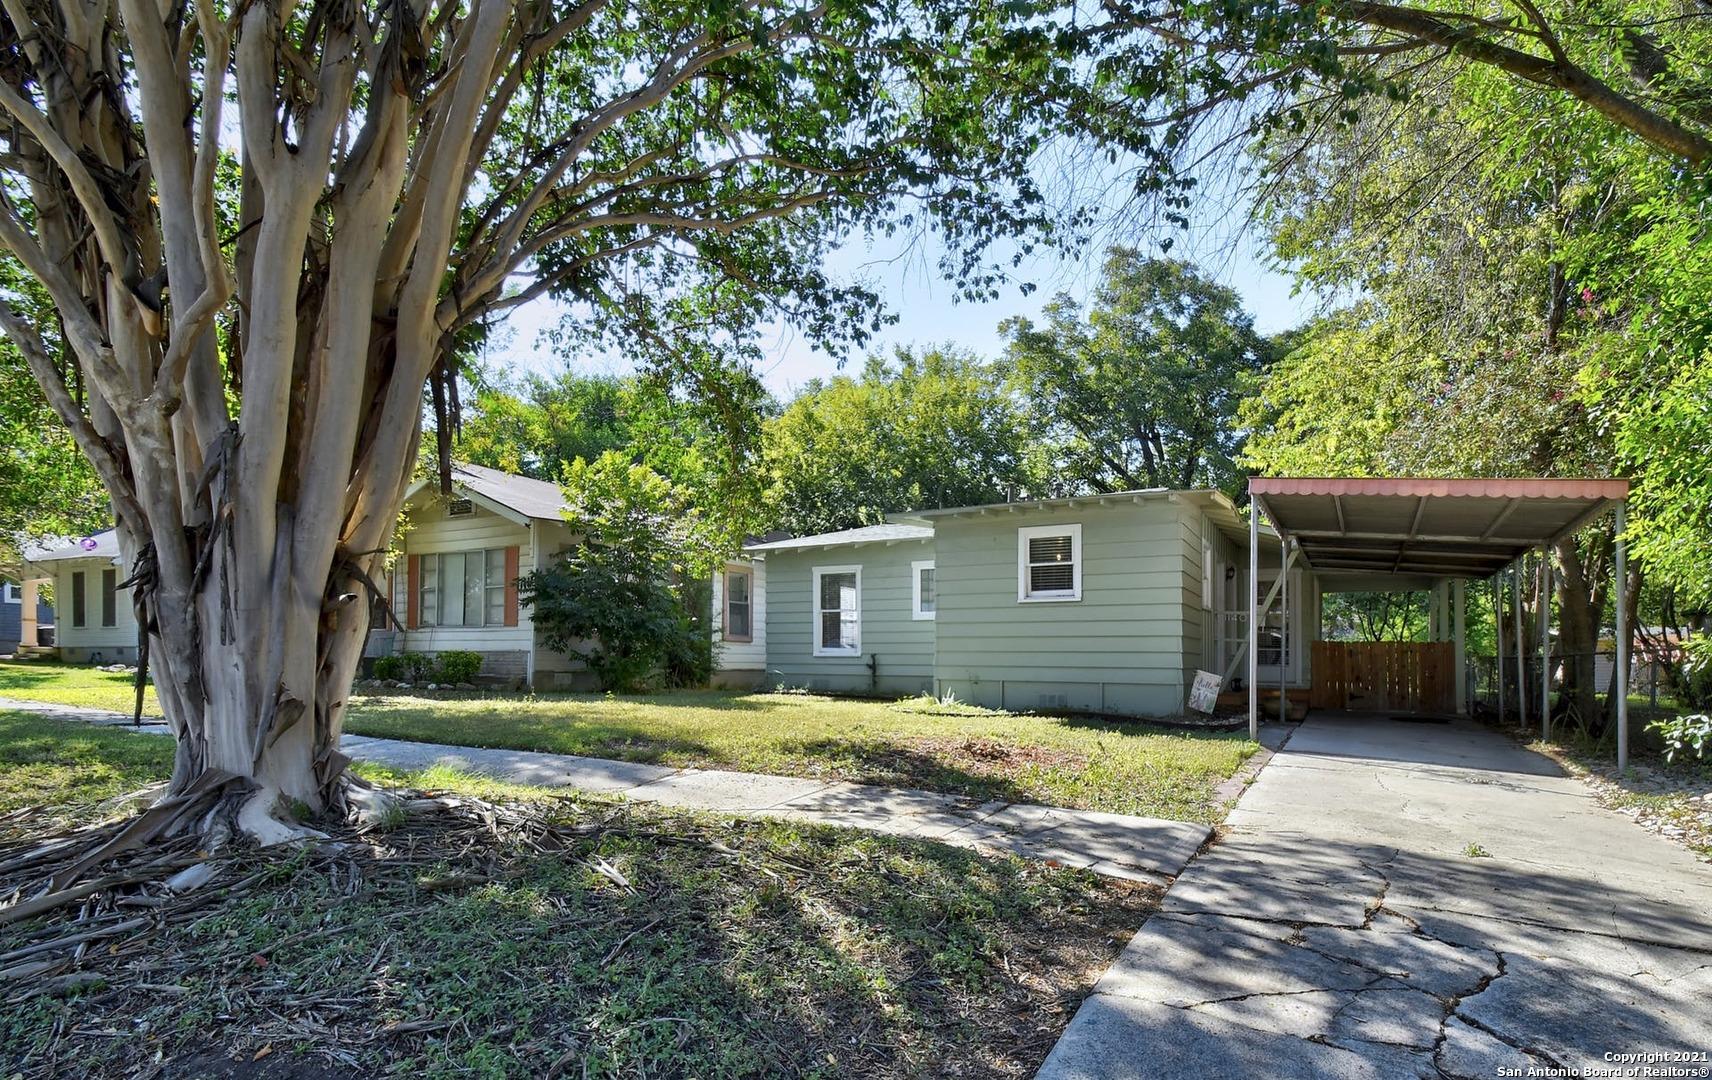 1140 W HUISACHE AVE, San Antonio, TX 78201